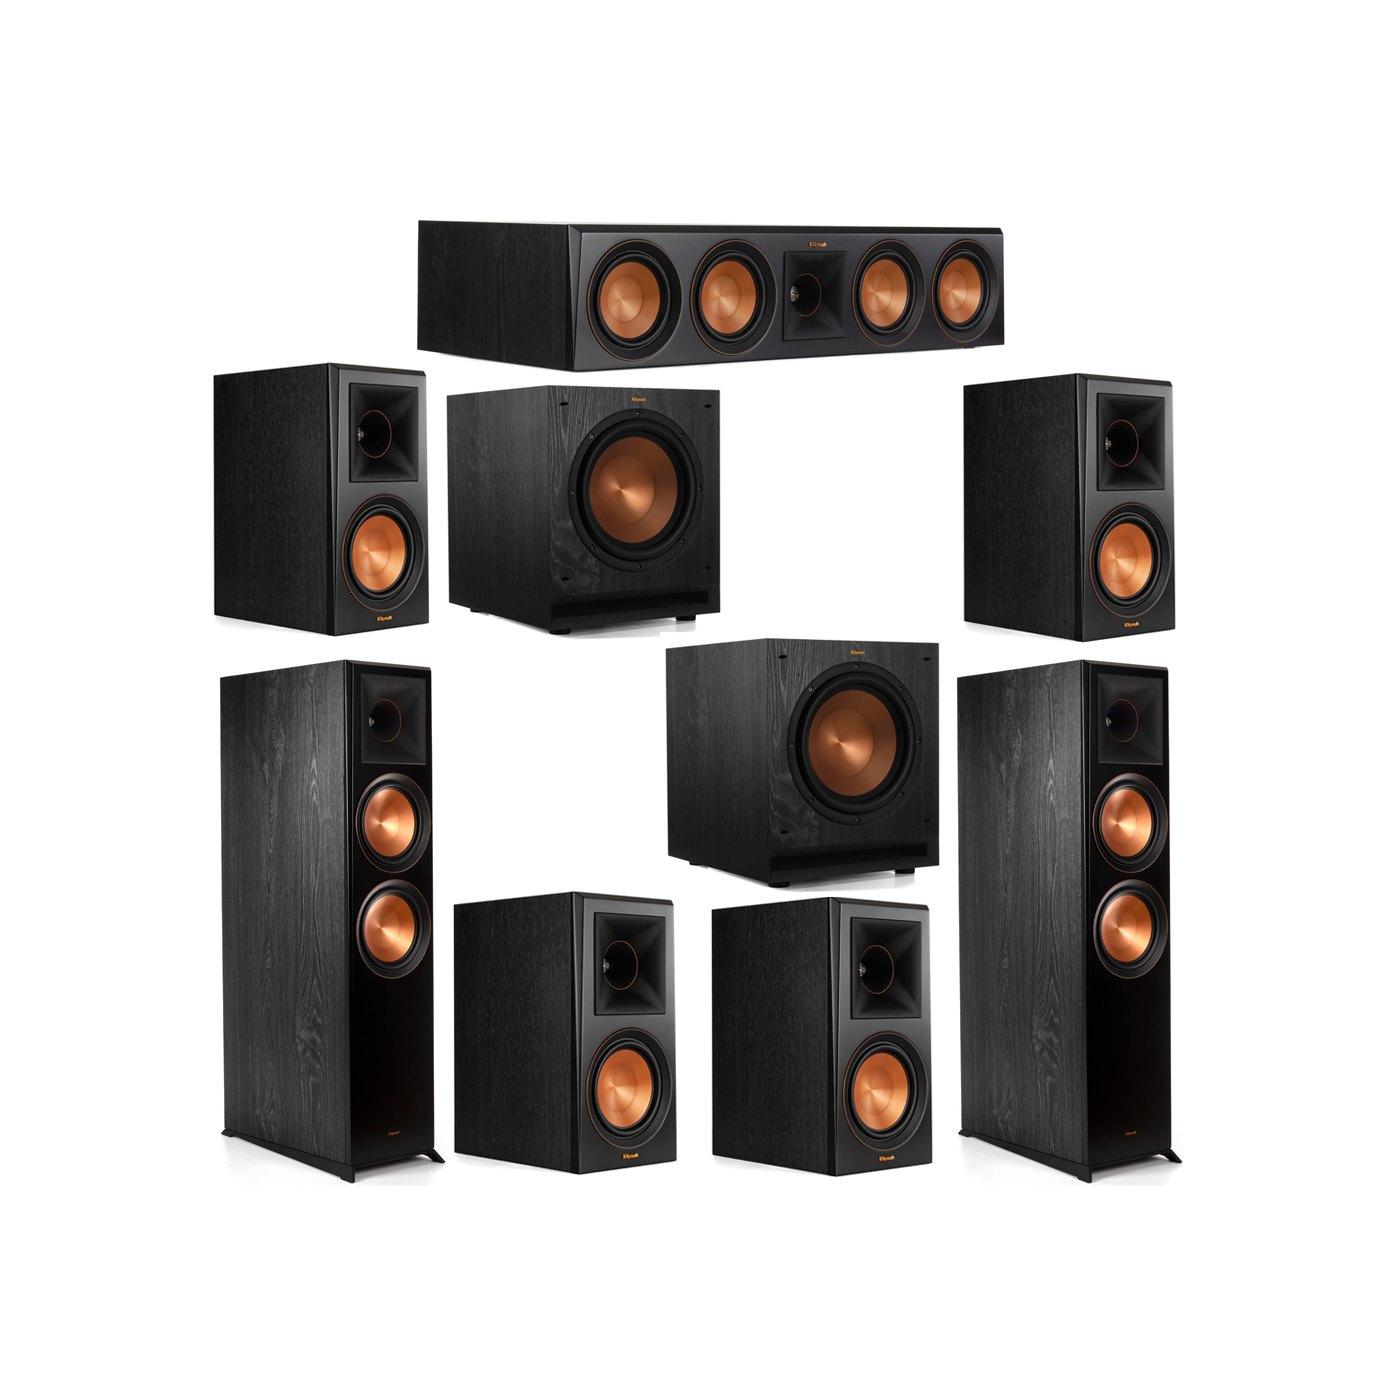 Klipsch 7.2 System with 2 RP-8000F Floorstanding Speakers, 1 Klipsch RP-504C Center Speaker, 4 Klipsch RP-600M Surround Speakers, 2 Klipsch SPL-100 Subwoofers